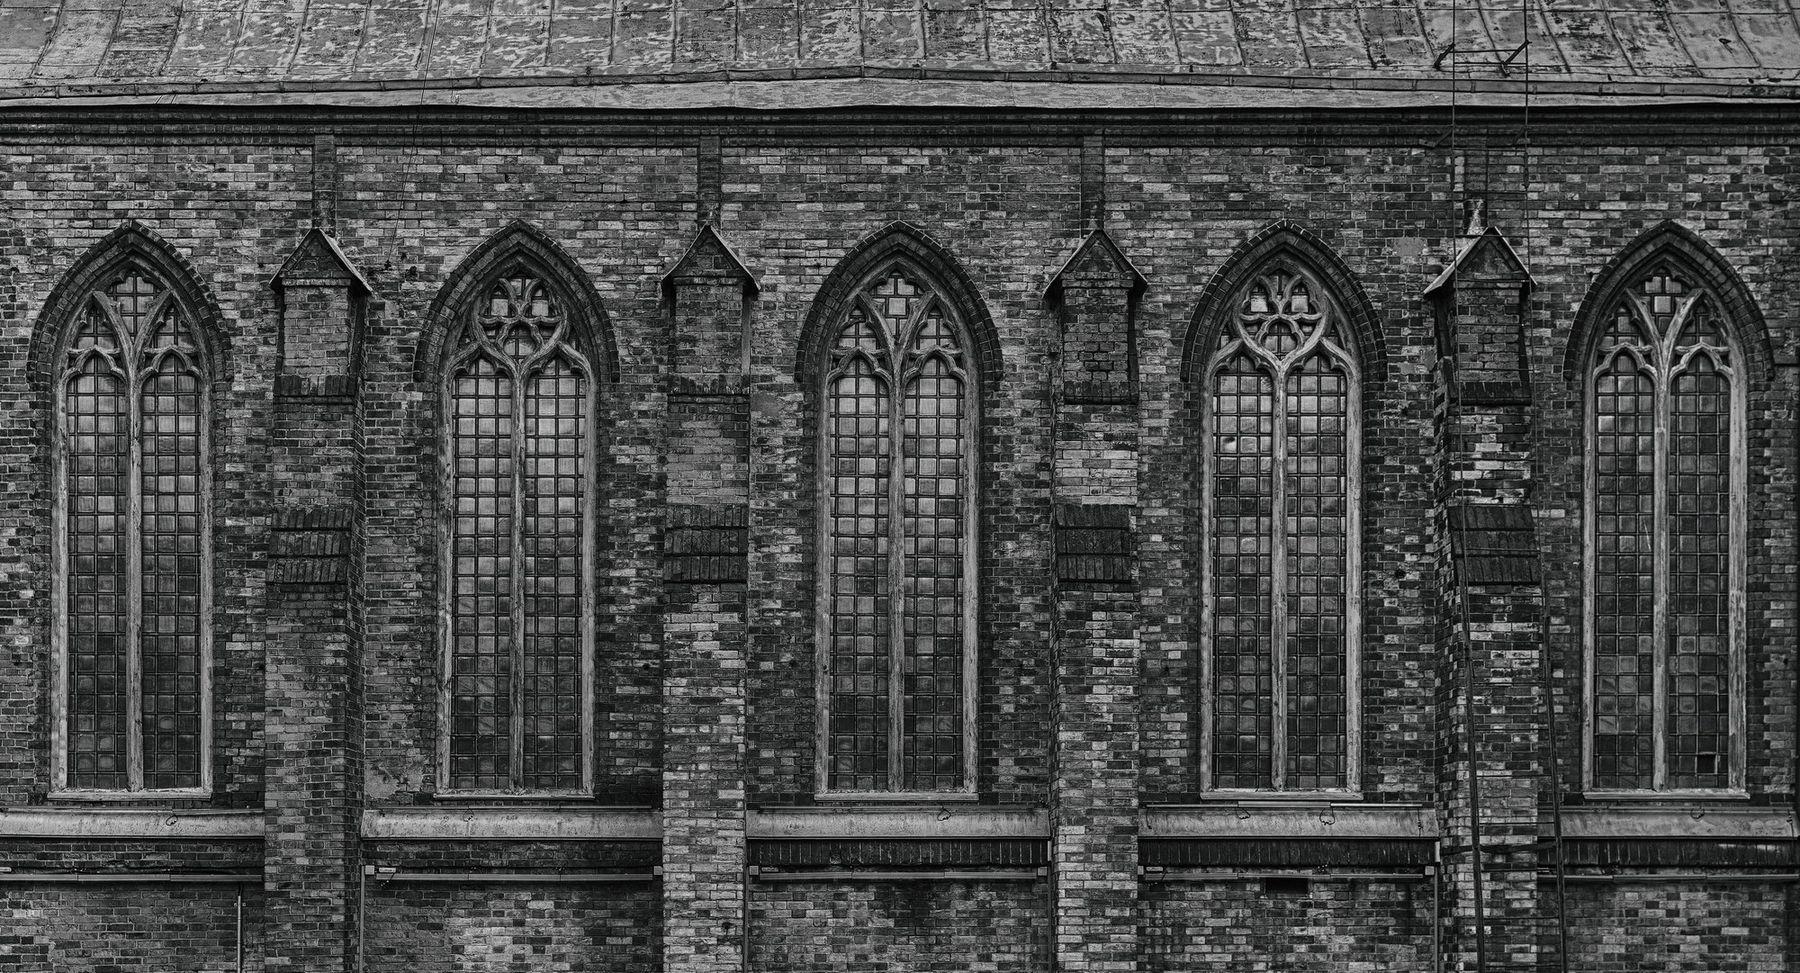 Gothic чб черно-белое храм москва гум готика архитектура